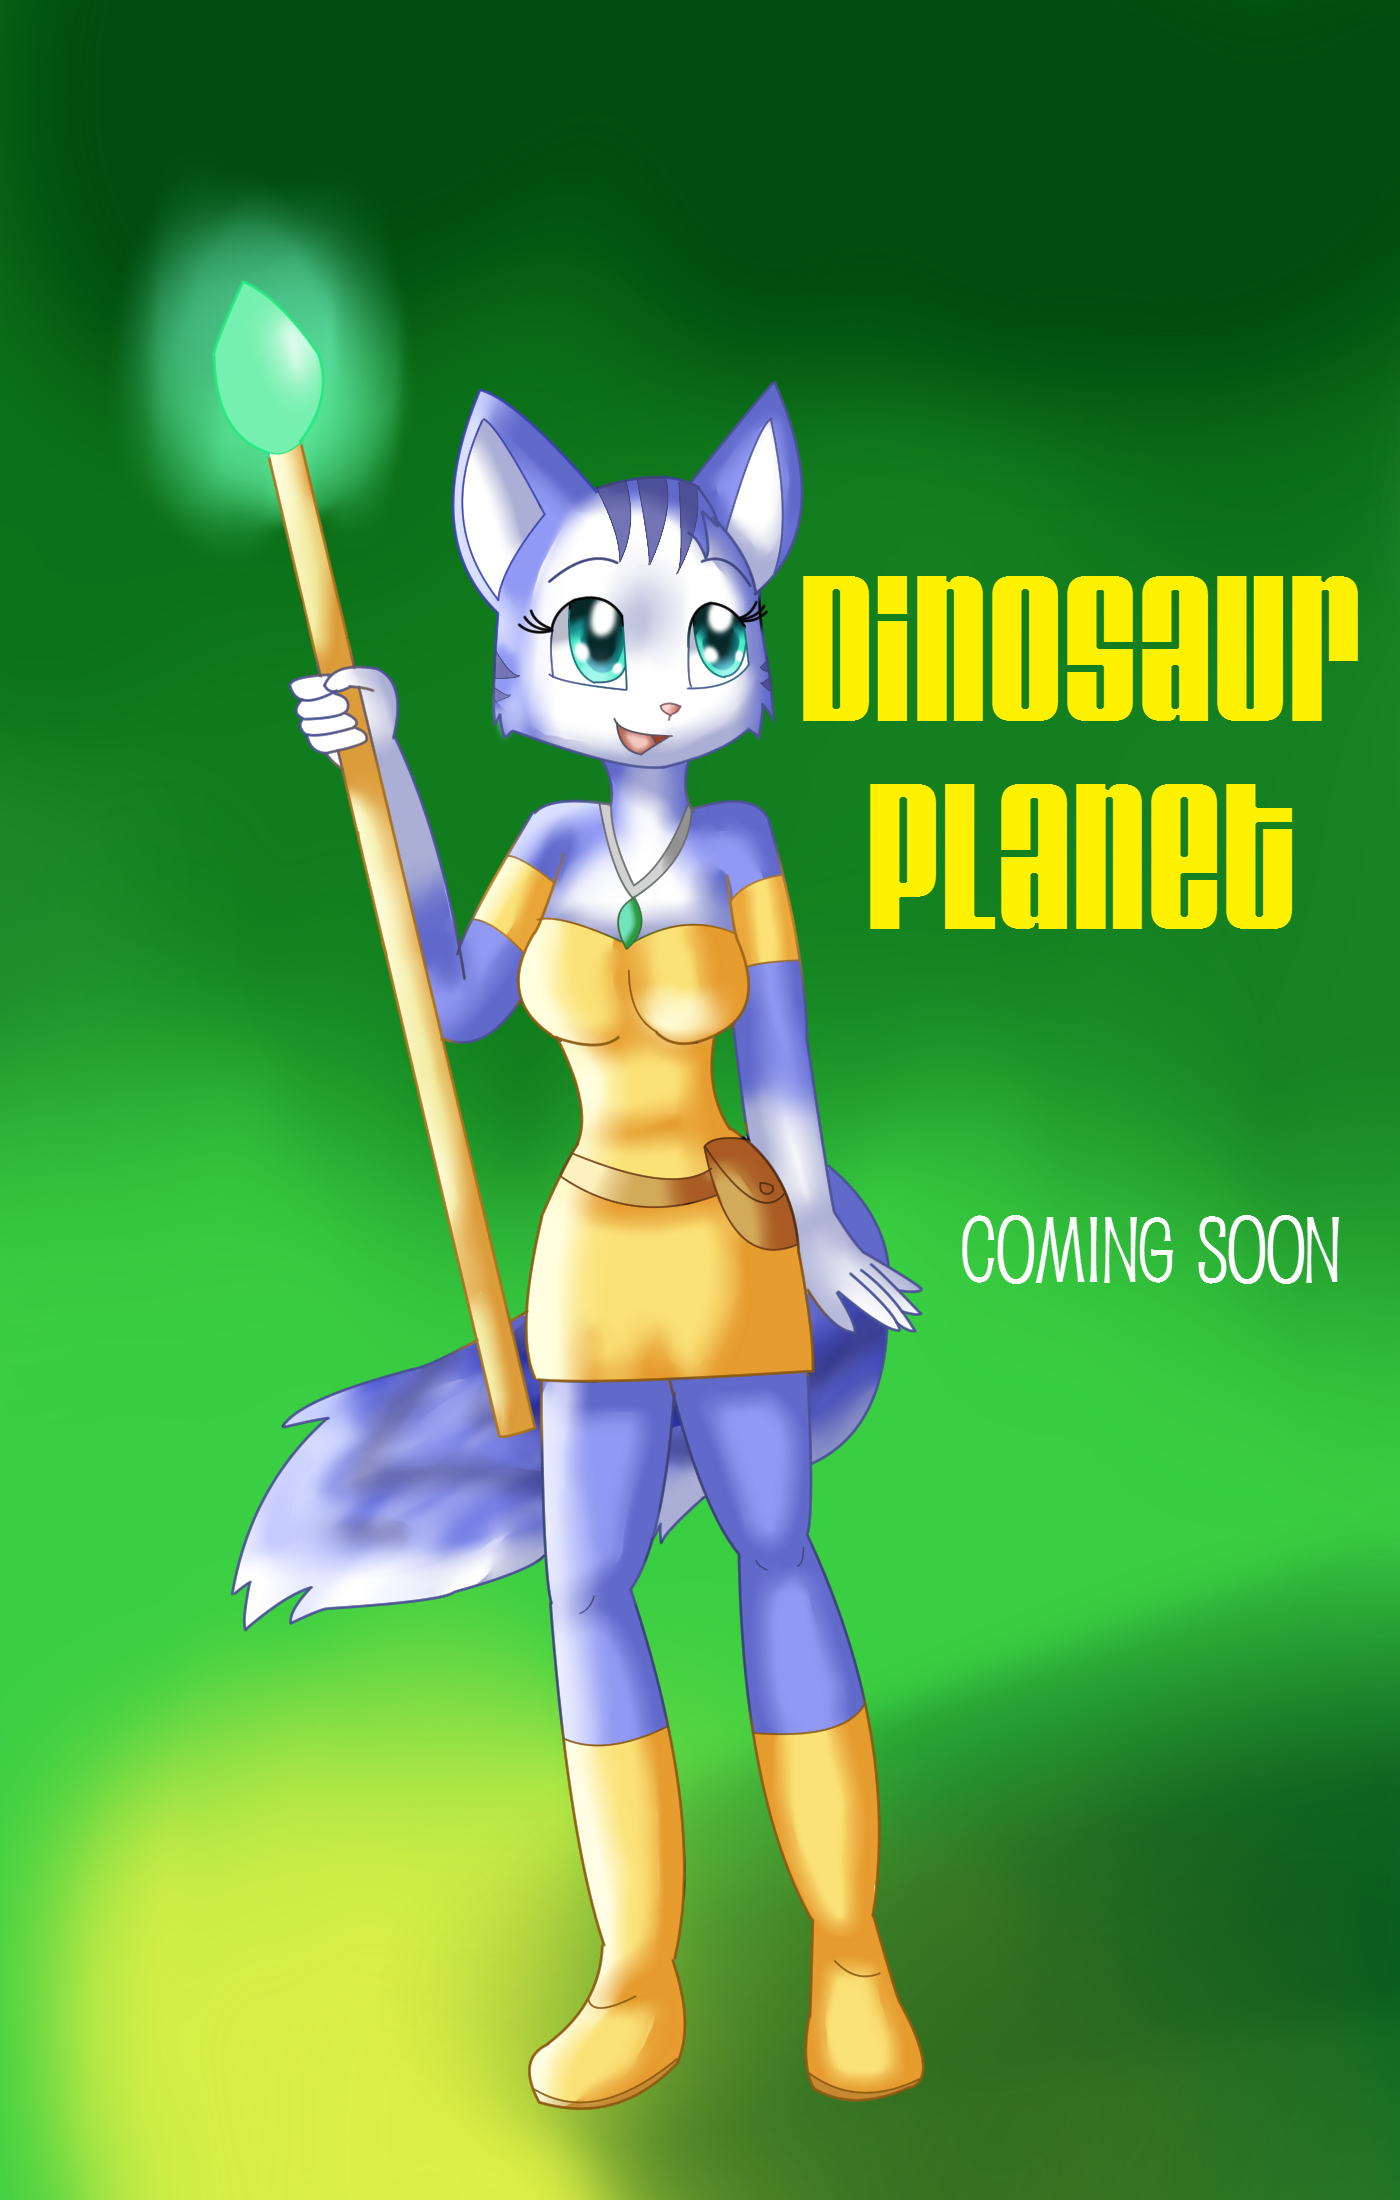 Dinosaur Planet Fan Series Poster 2017